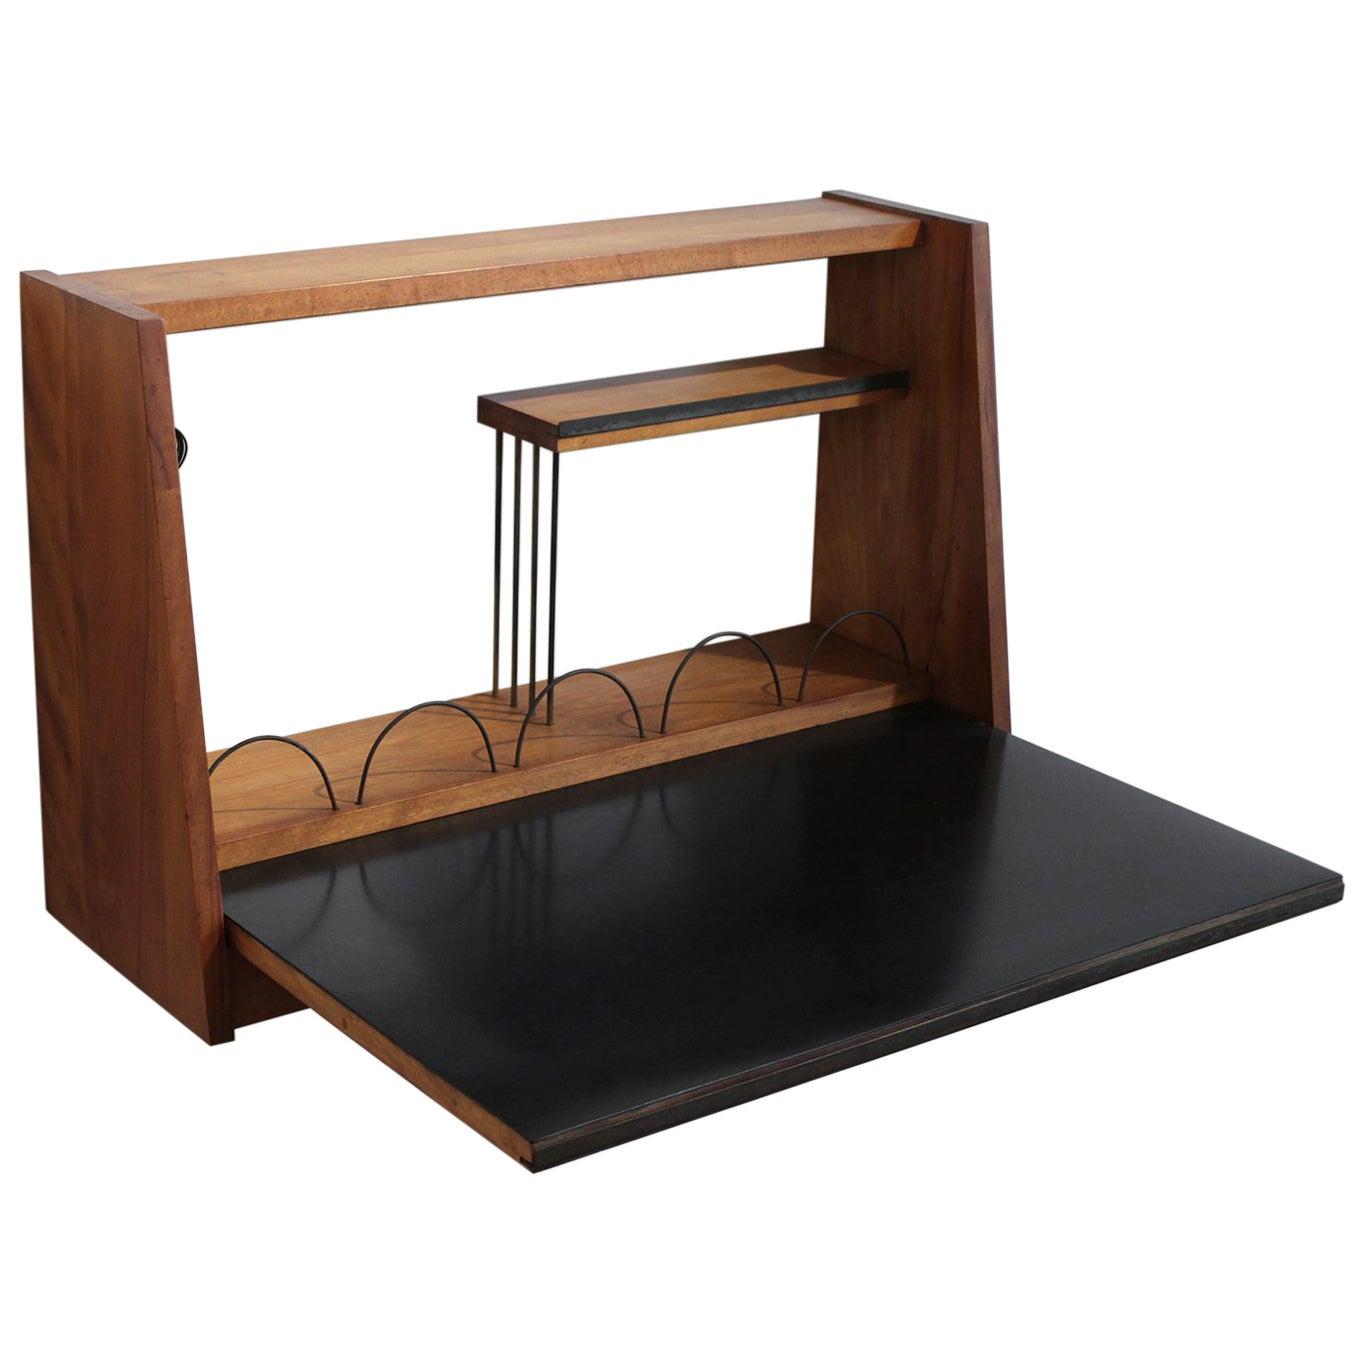 Custom 1950s Wall Mounted Modernist Writing Desk